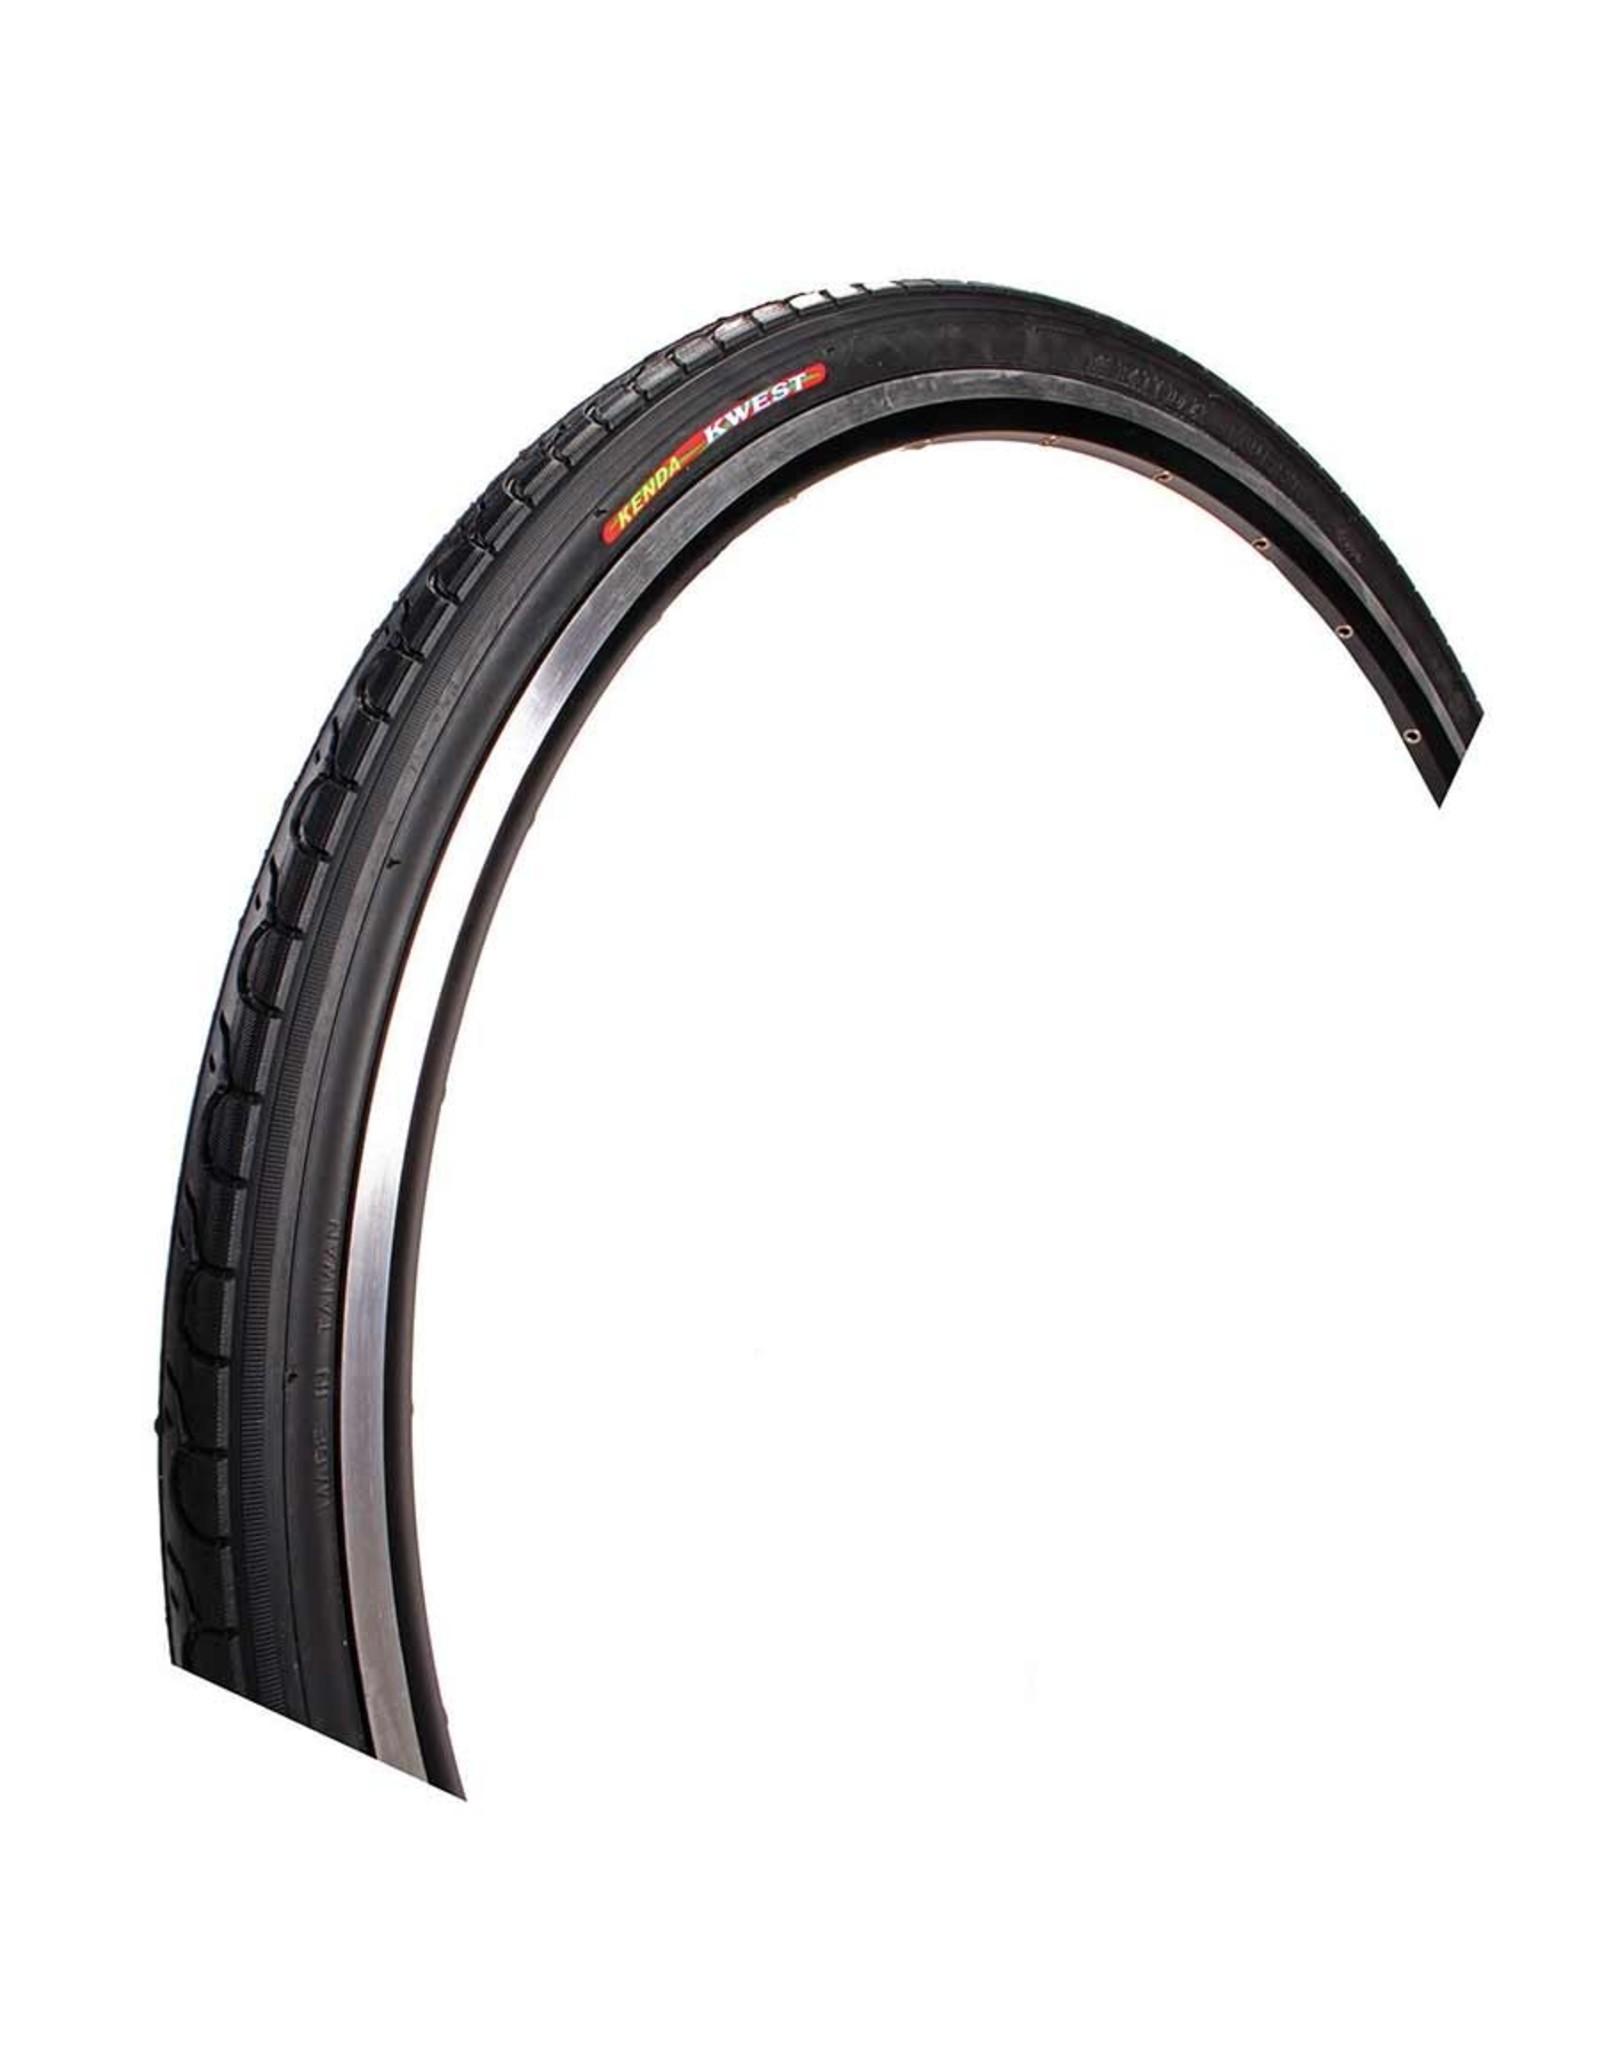 Kenda Kenda, Kwest, Tire, 700x32C, Wire, Clincher, SRC, K-Shield, 30TPI, Black